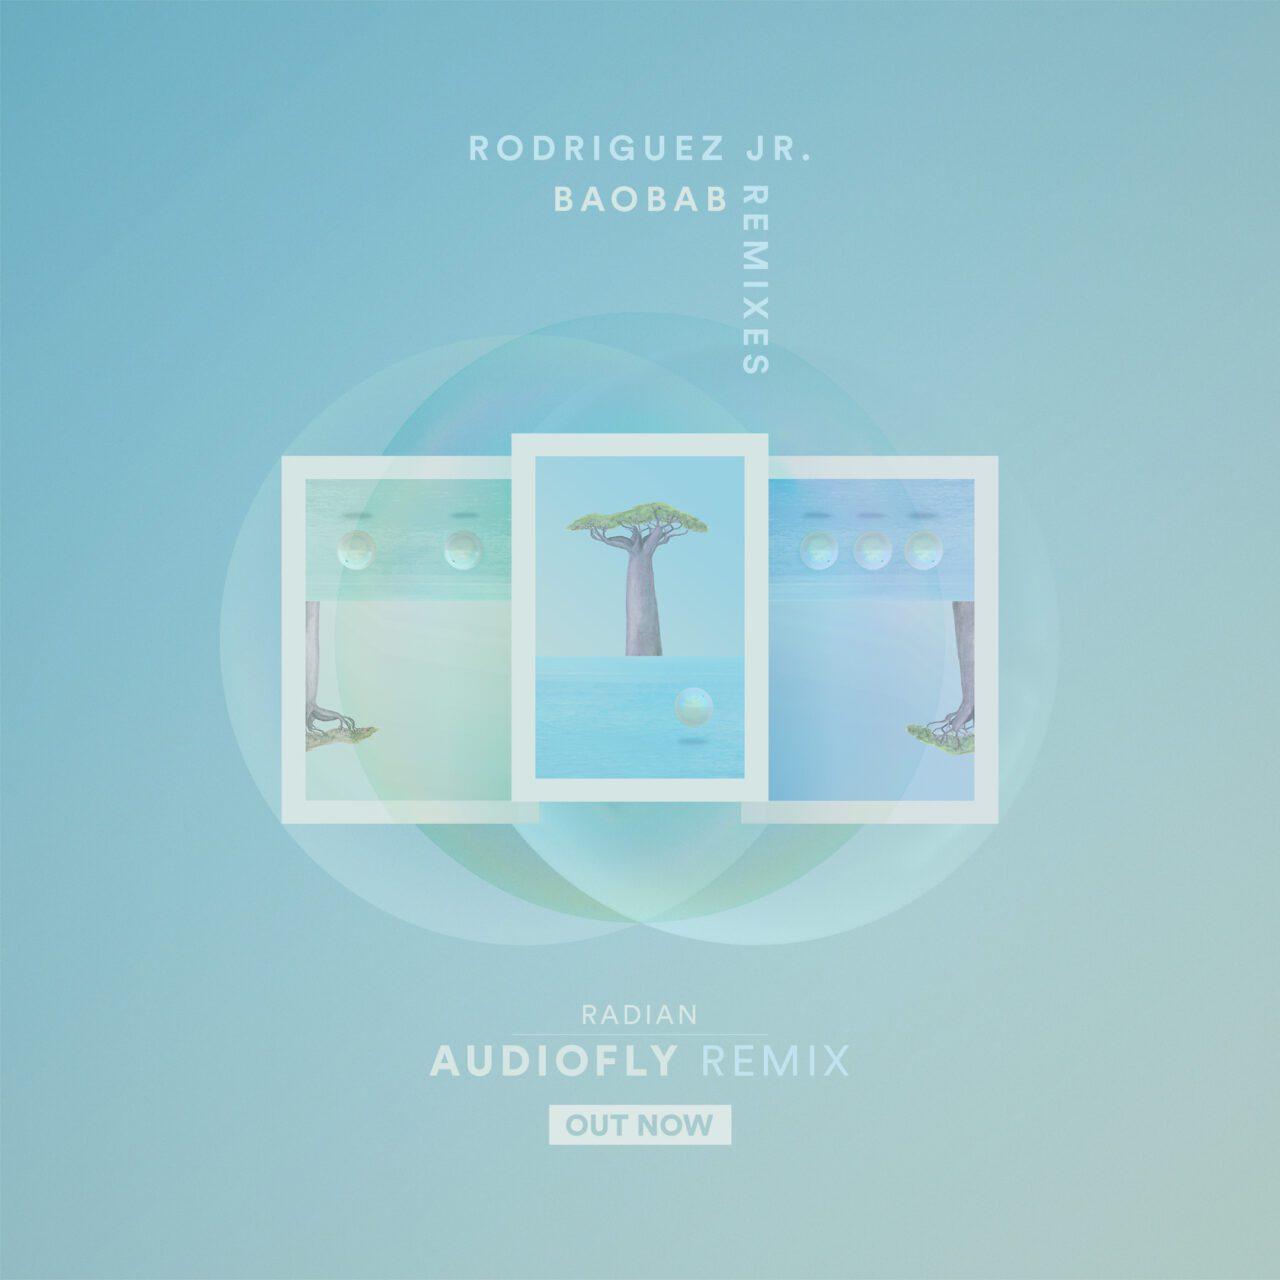 RodriguezJr_Baobab_Remixes_01-Audiofly_instagram